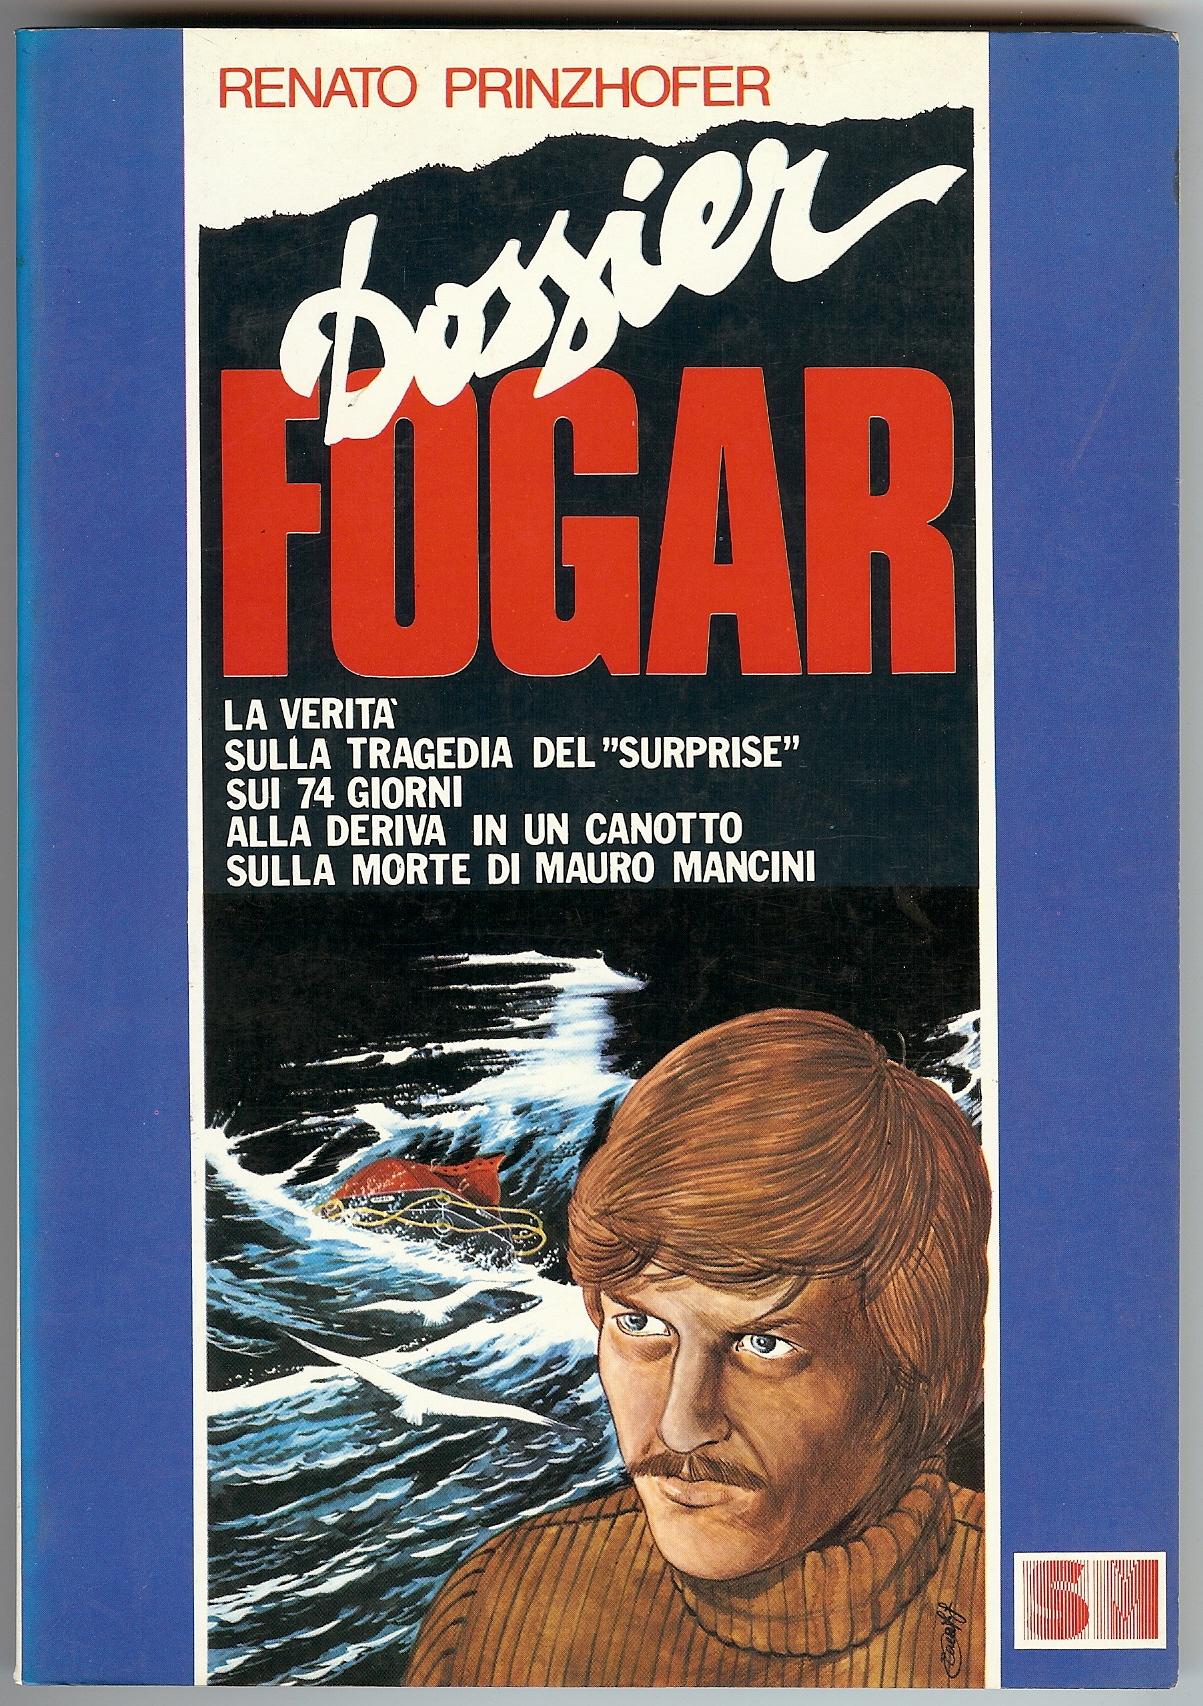 Dossier Fogar